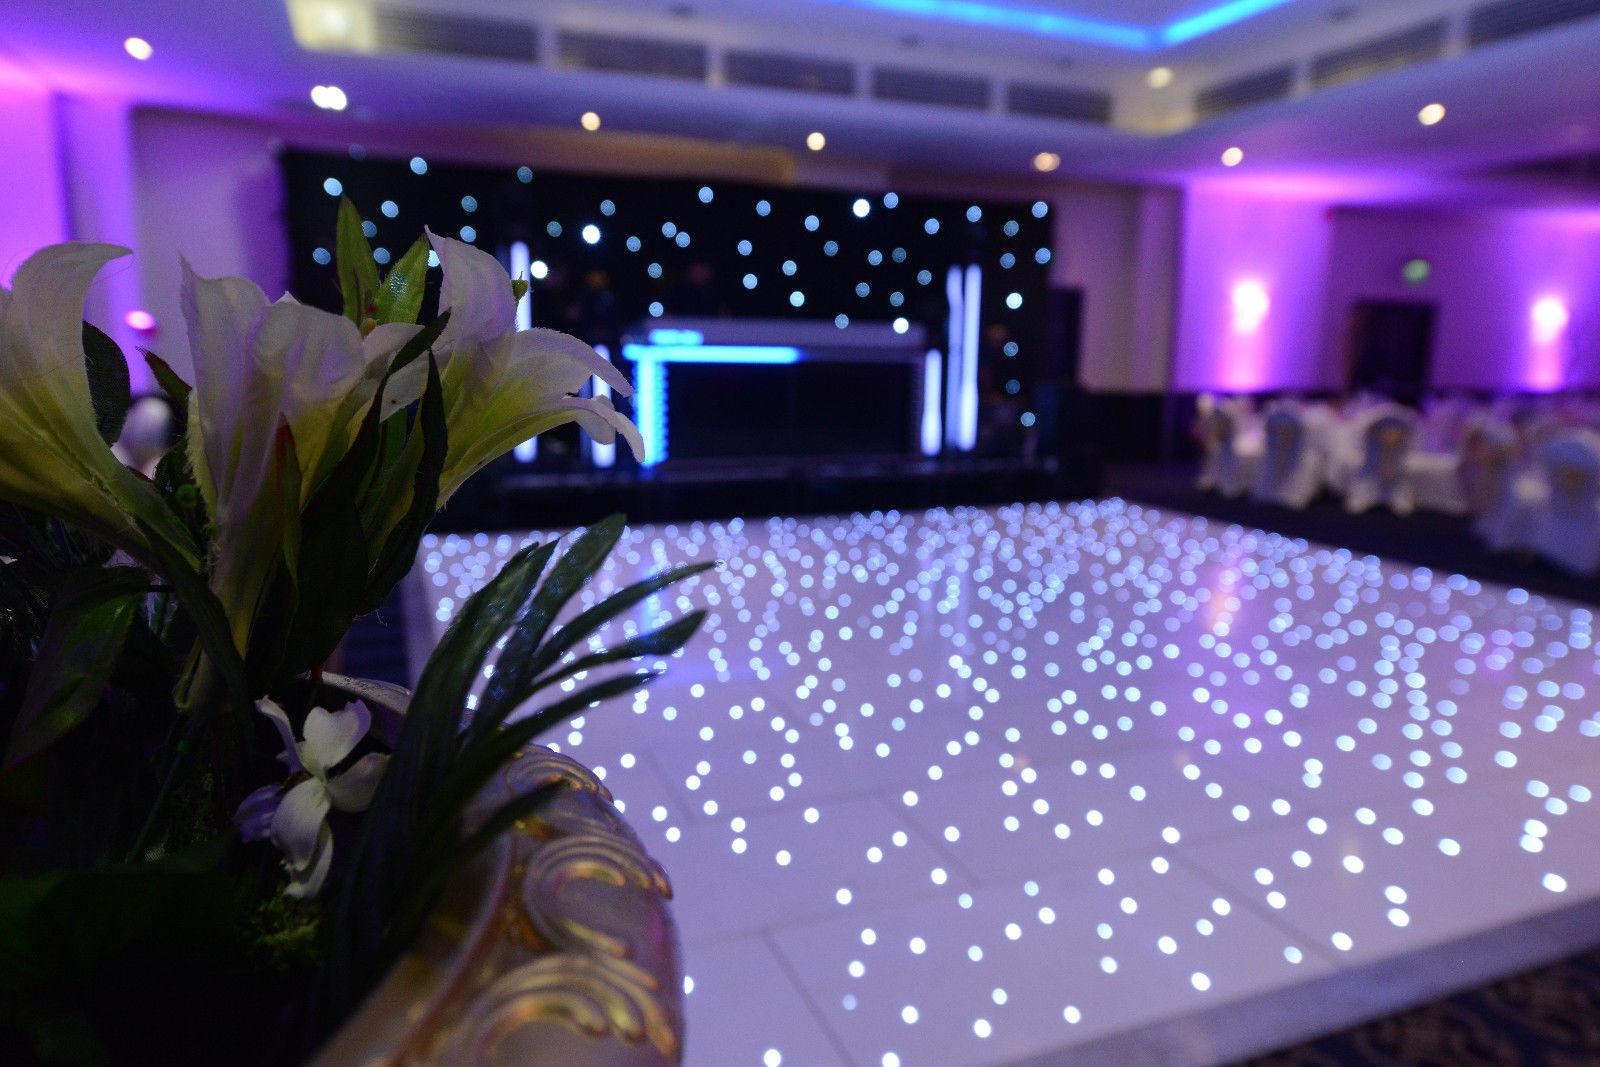 Starlit Twinkle LED Dance Floor